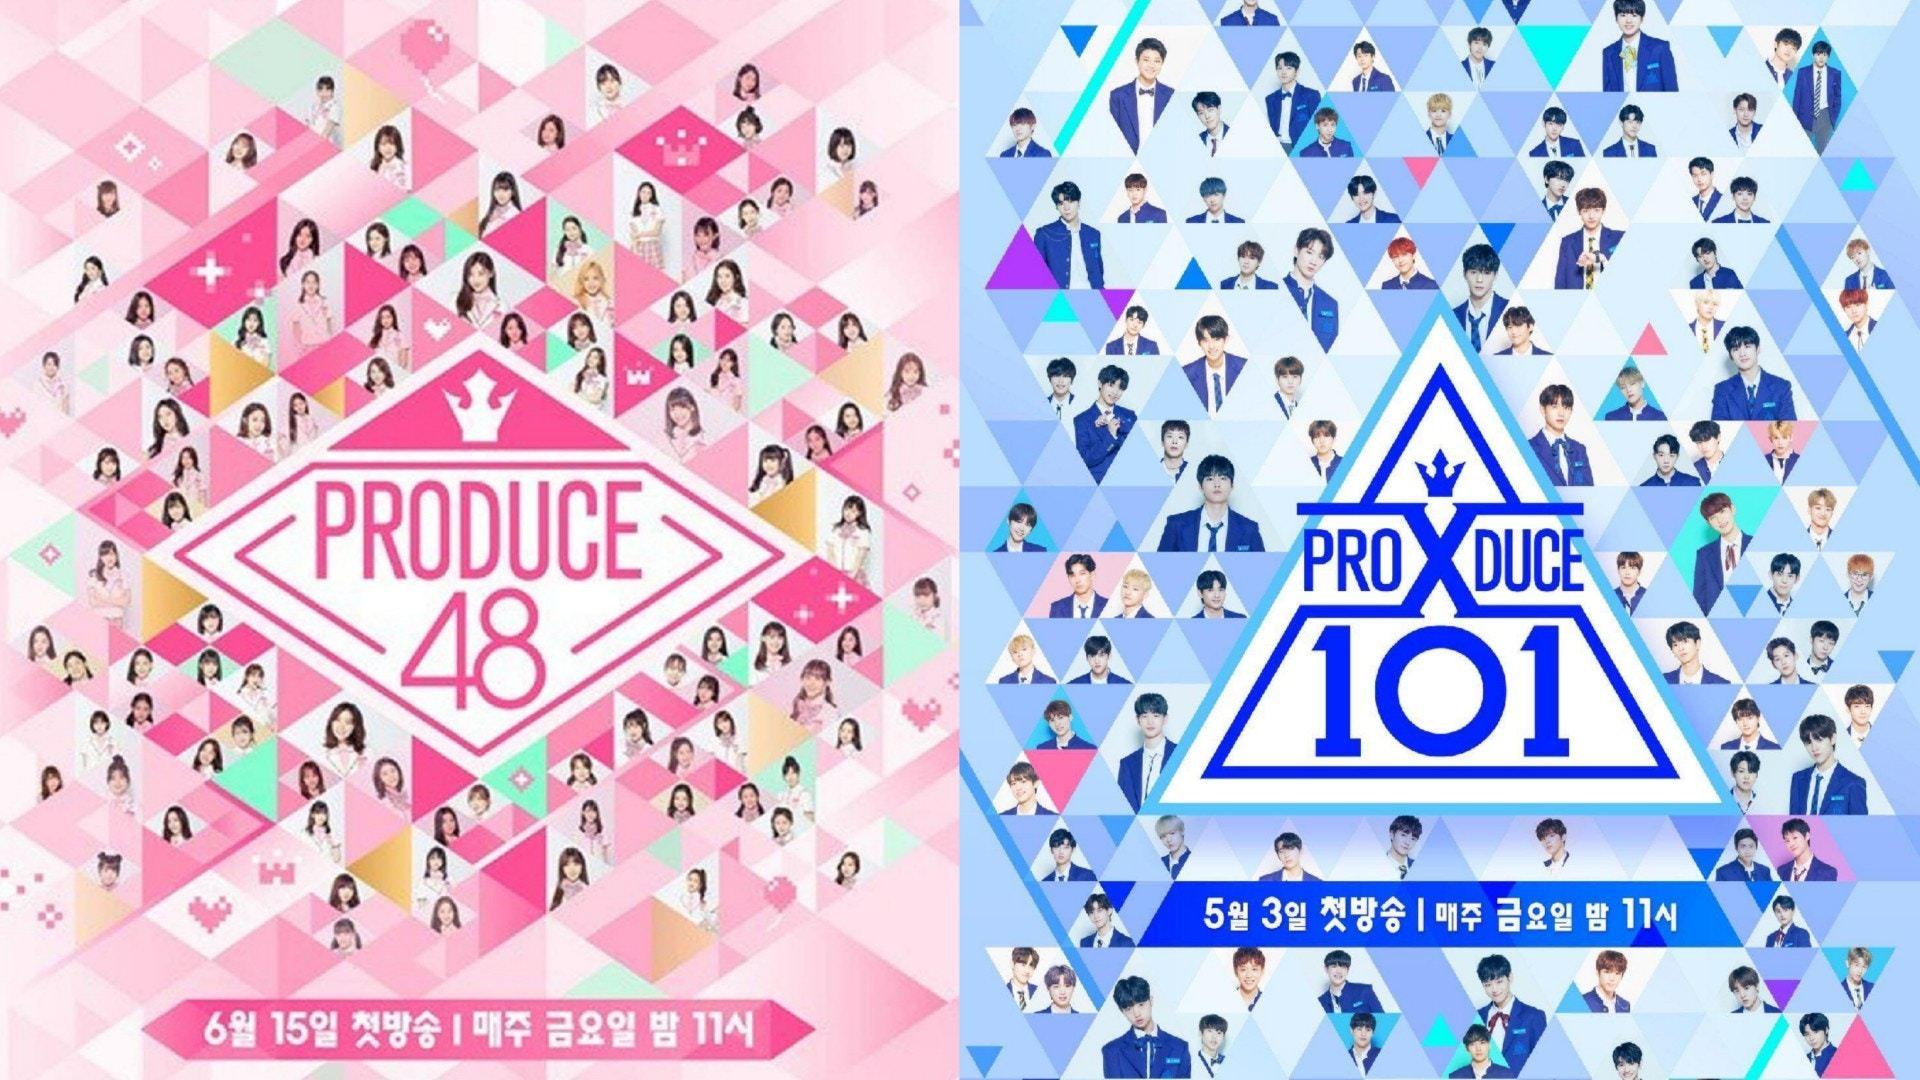 《Produce 101》系列造假案今天终审,制作人安俊英将被判刑3年并罚款3600万韩元插图1